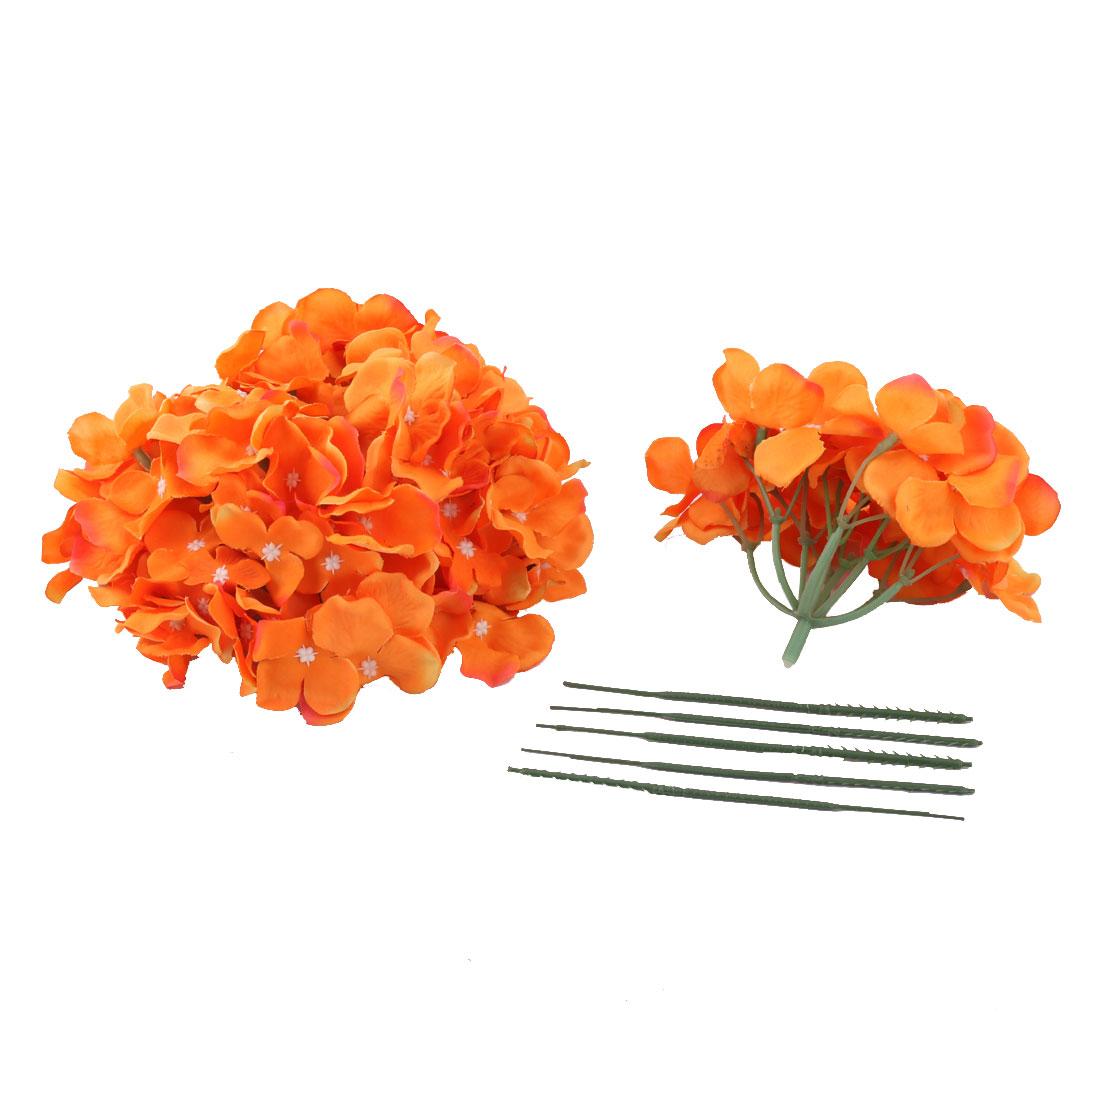 Celebration Aritificial Flower Handcraft Garland Bouquet Decor Orange 5pcs